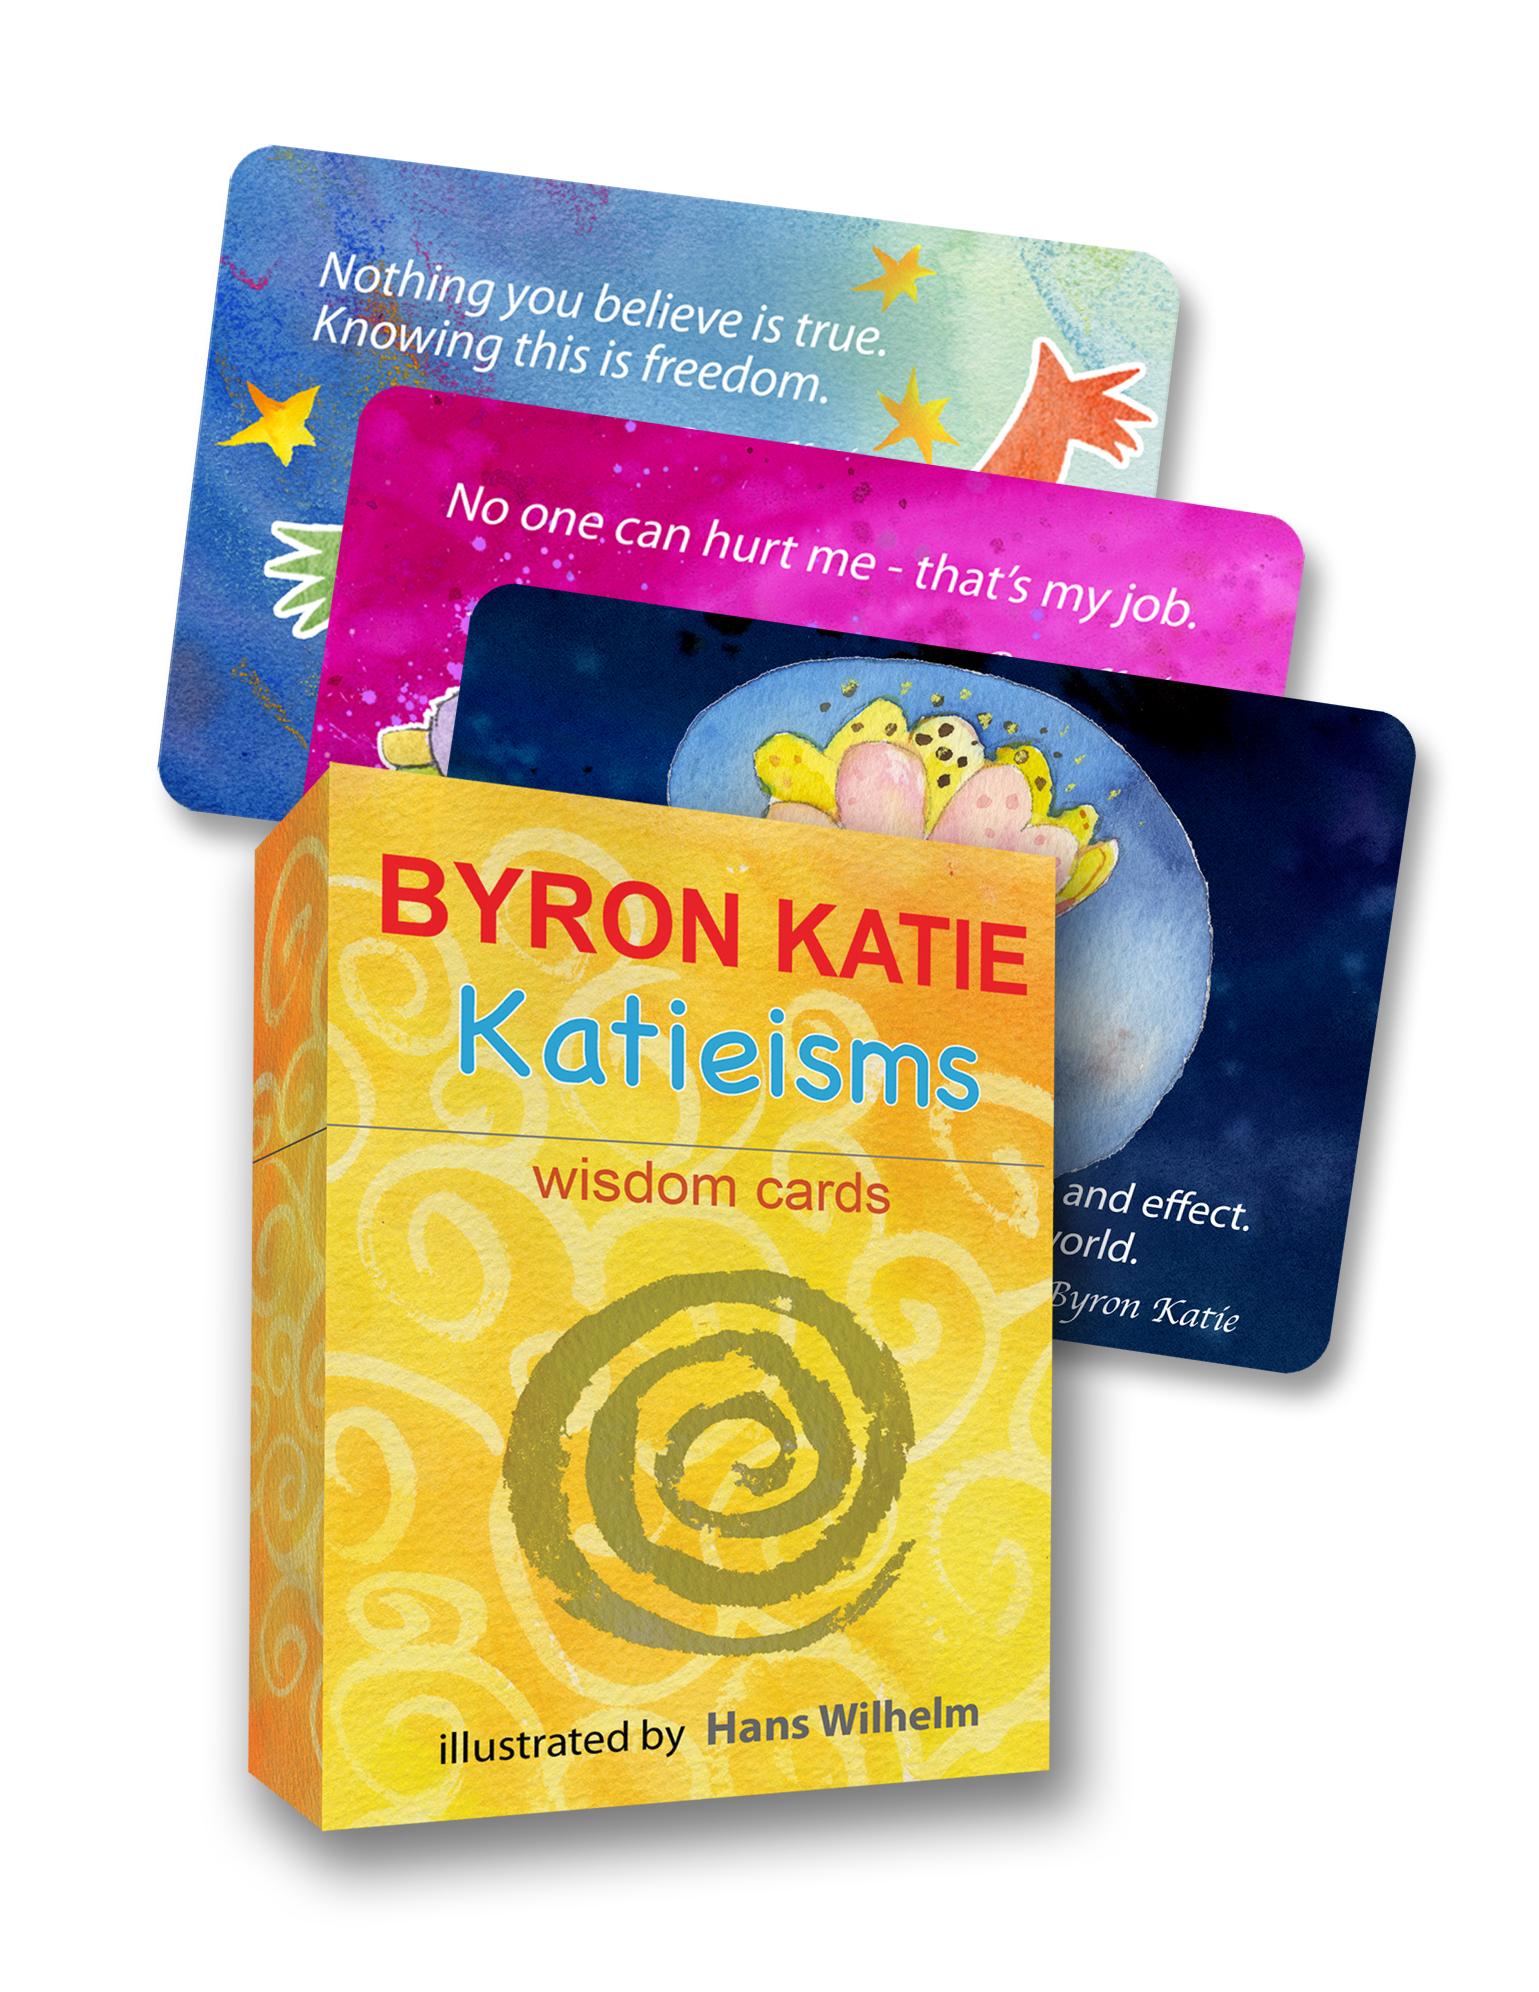 Katieisms cards 02 copy.jpg